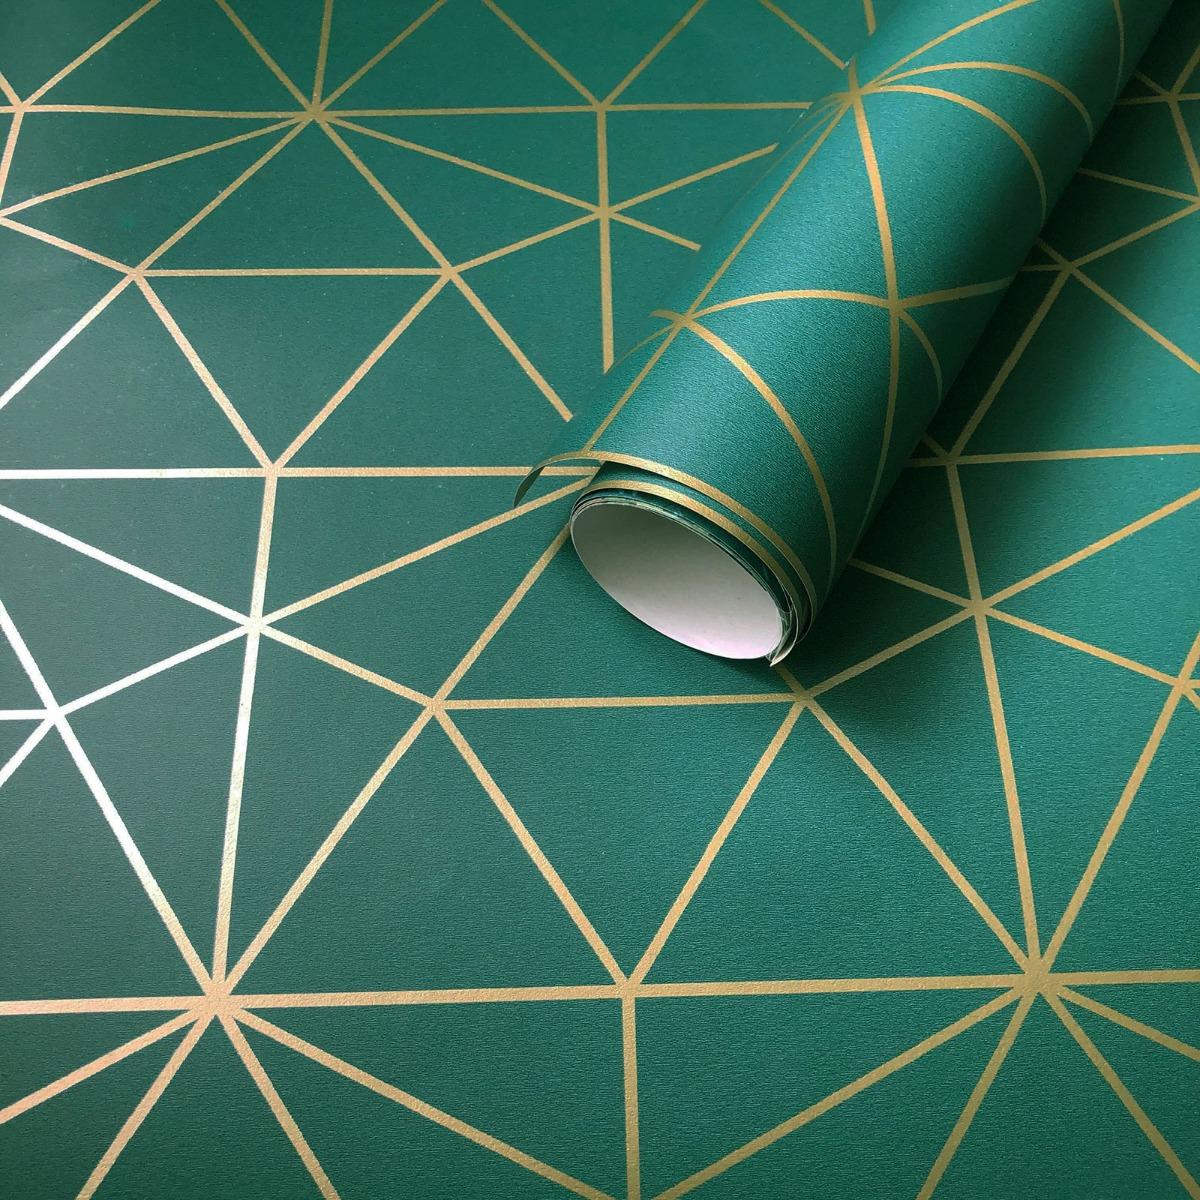 Metro Prism Geometric Triangle Wallpaper Emerald Green And Gold